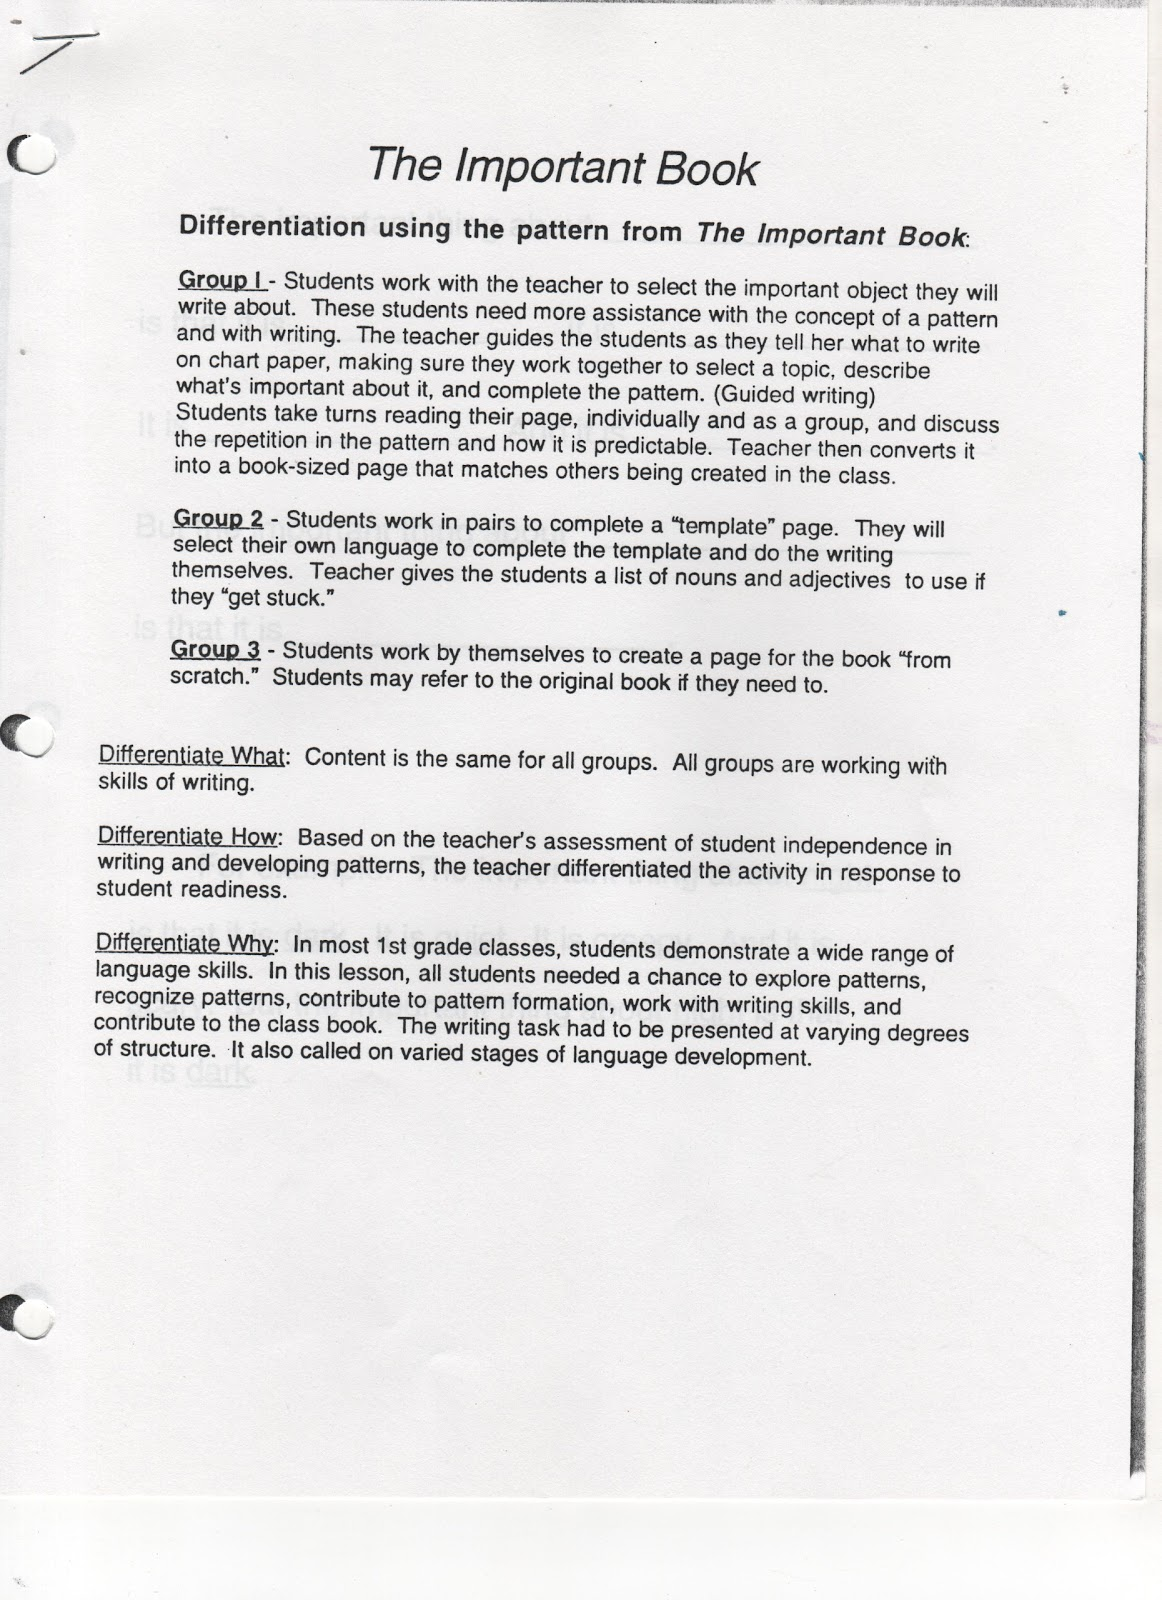 ELEMENTARY SCHOOL ENRICHMENT ACTIVITIES: THE IMPORTATNT BOOK